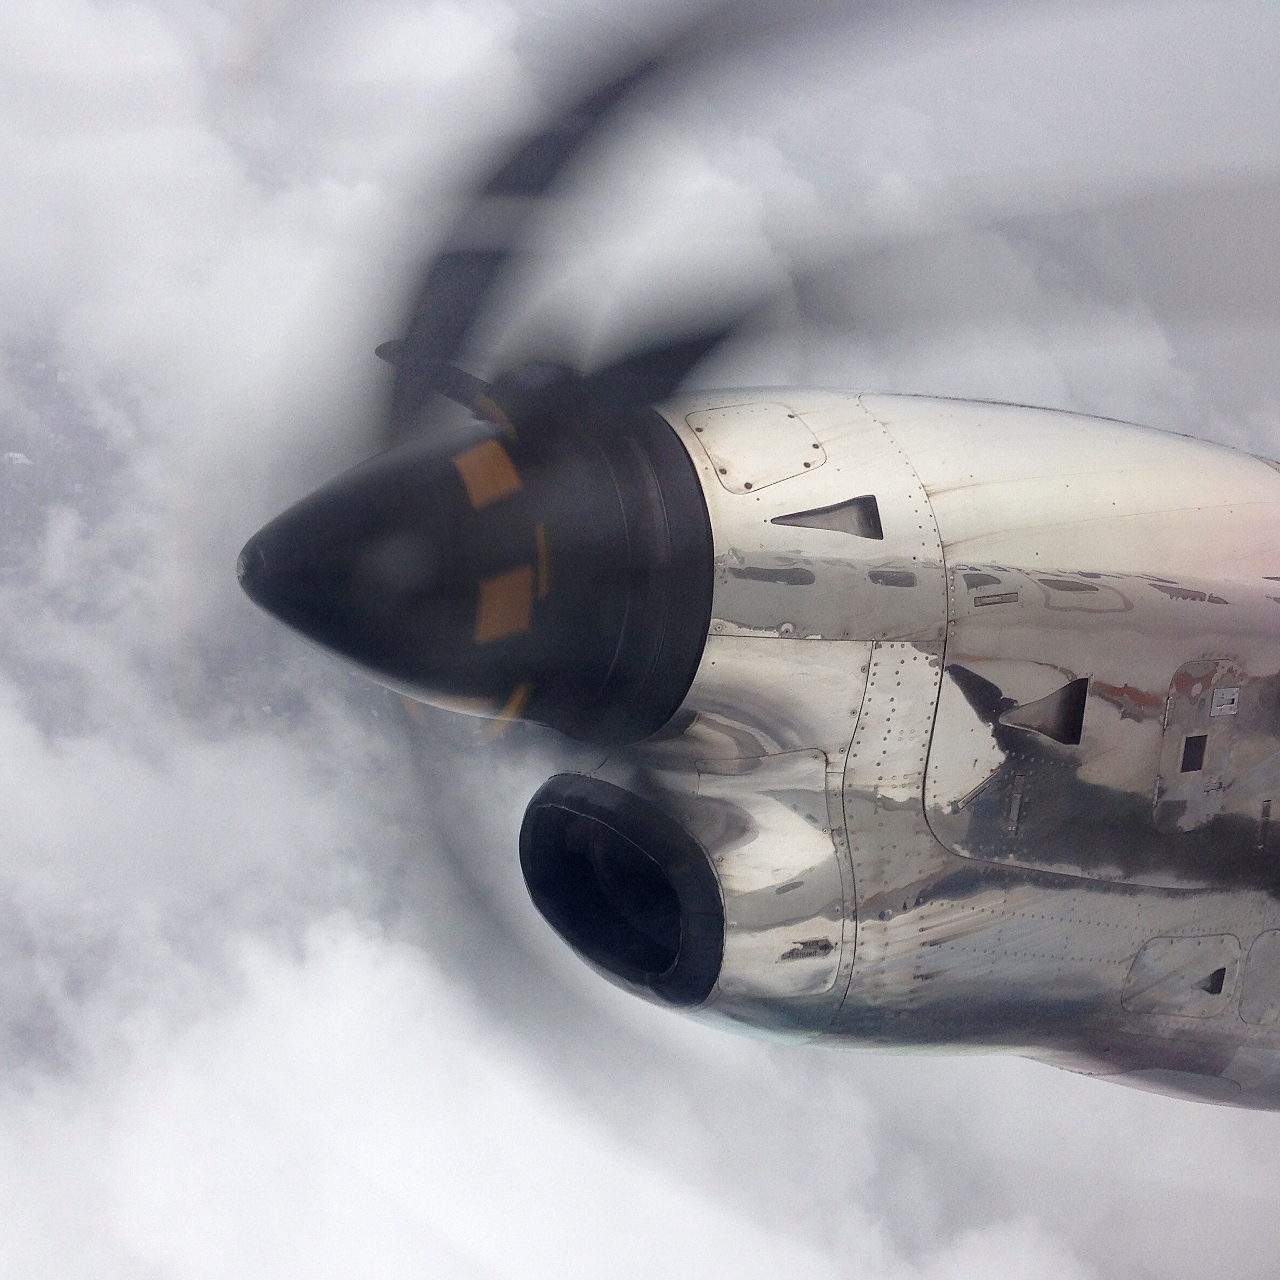 Window Seat on plane